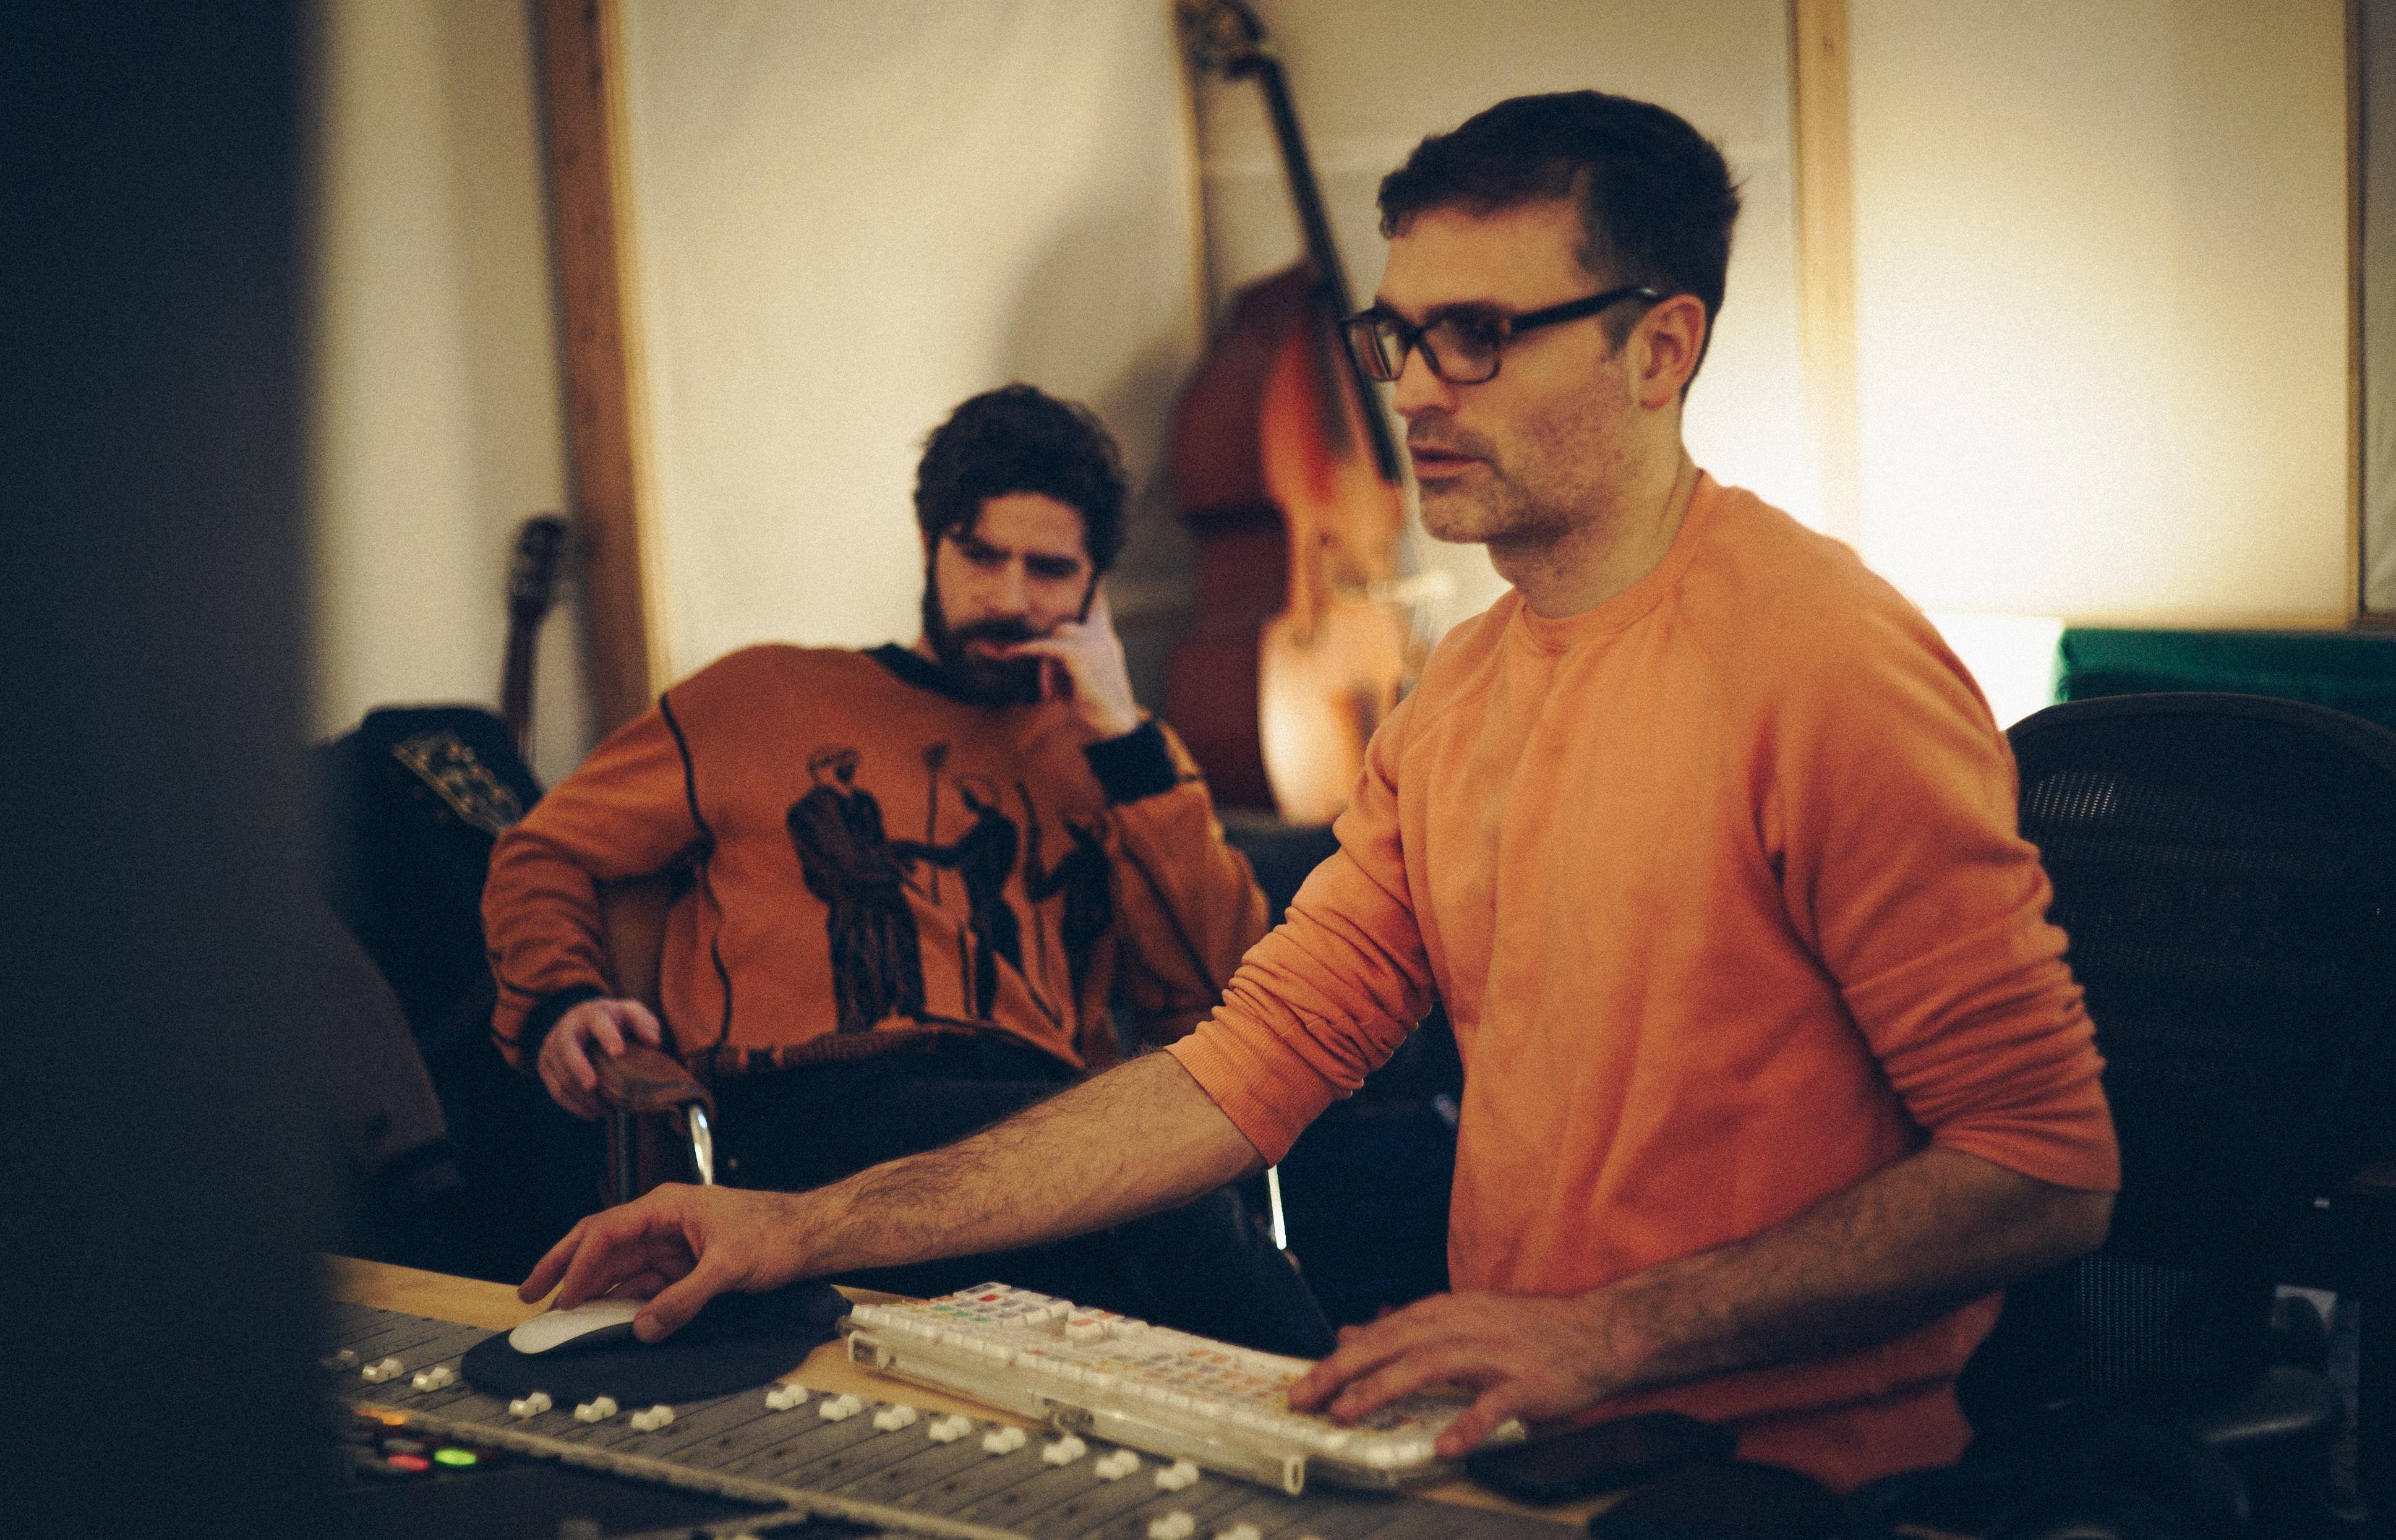 BRETT SHAW – 123 studios